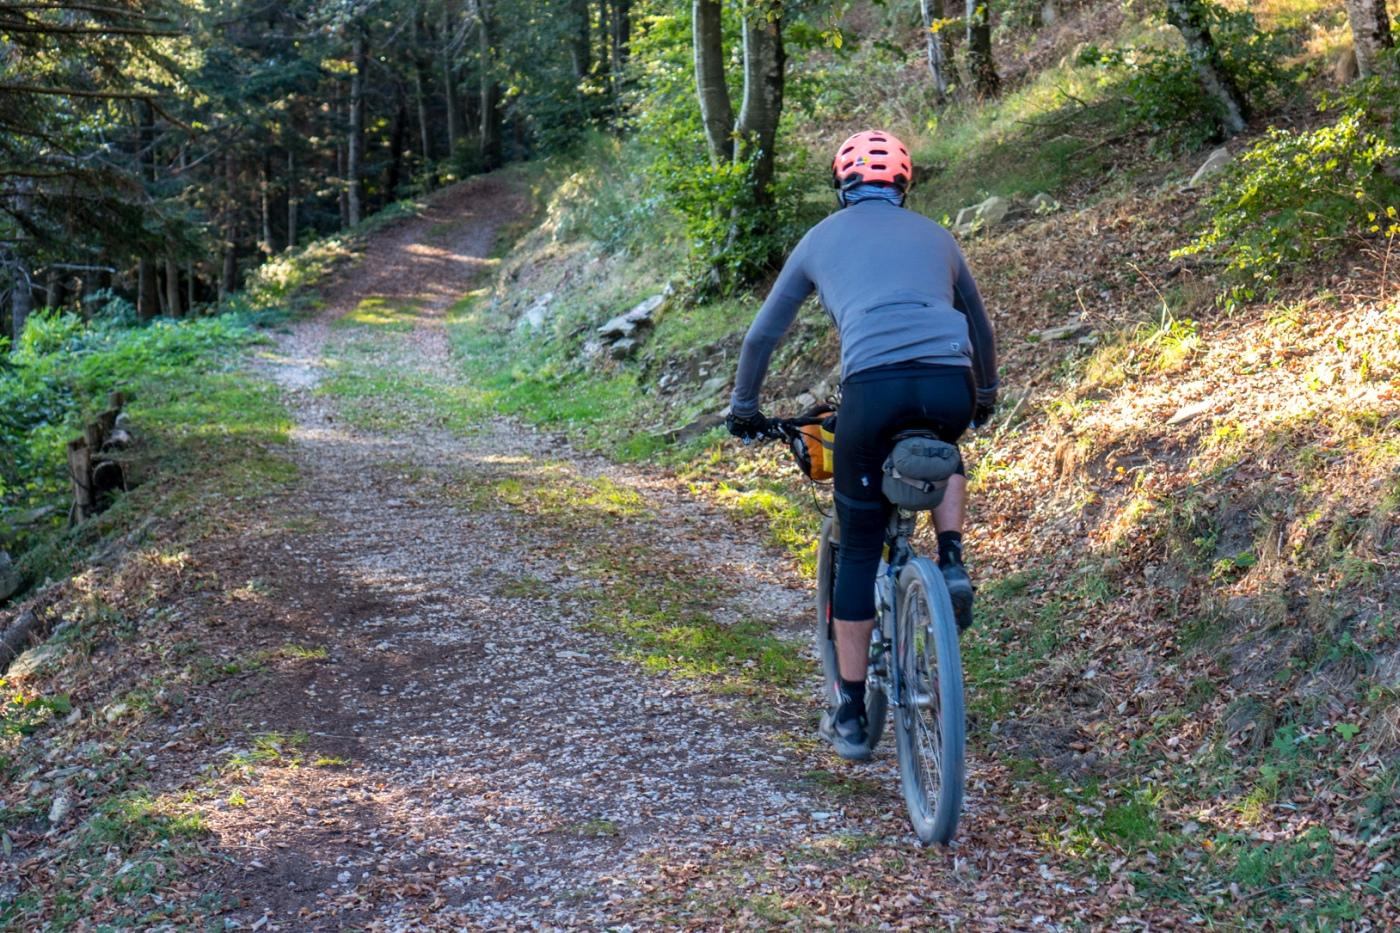 pratomagno_bikepacking-20